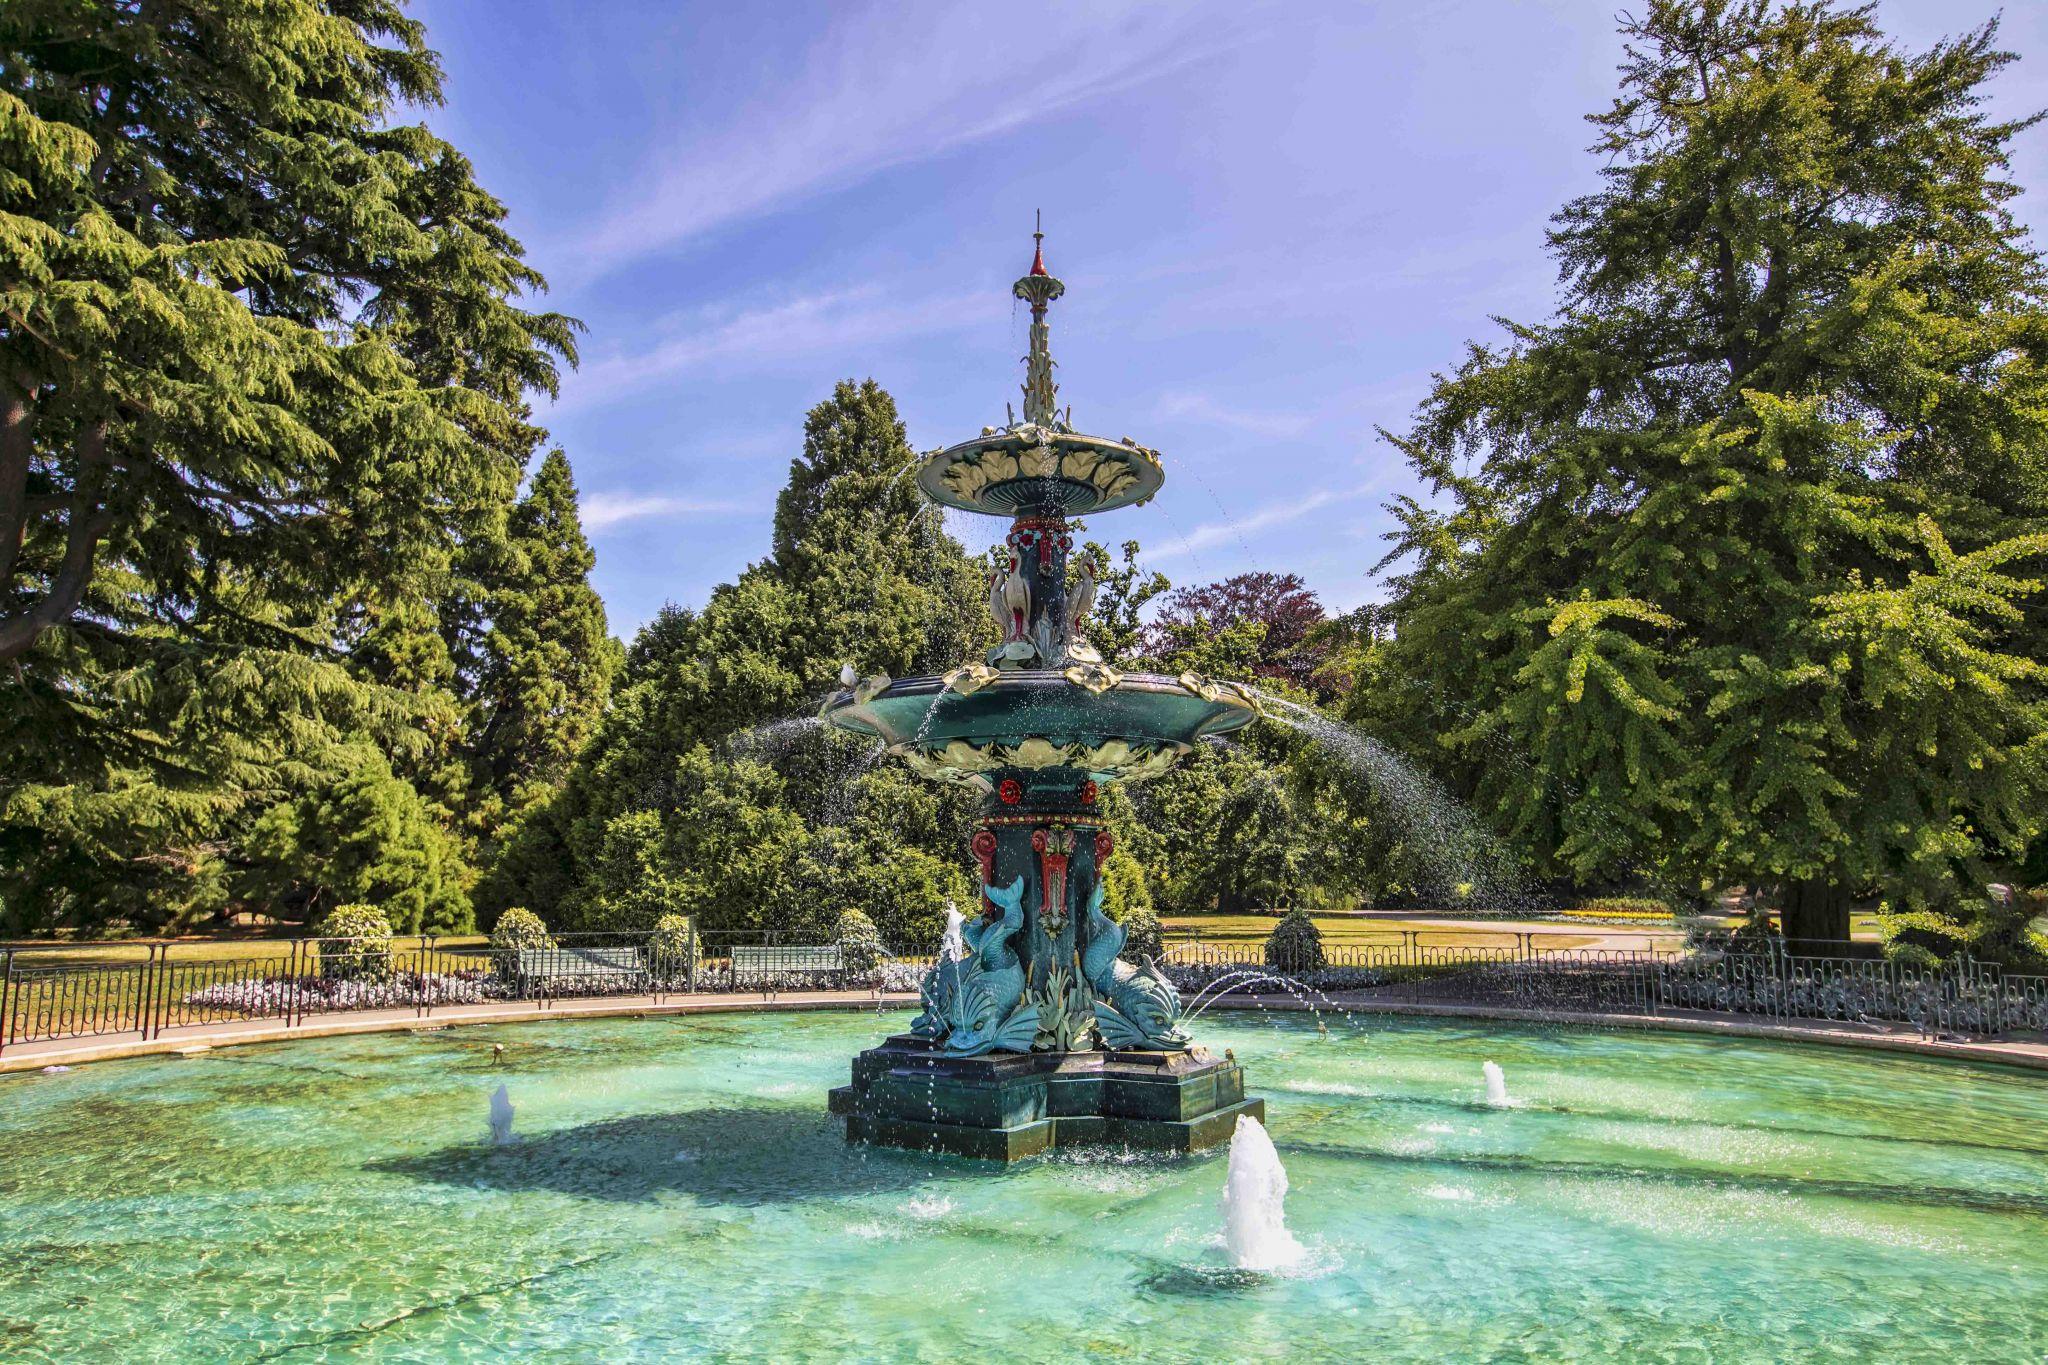 Peacock Fountain at Christchurch Botanic Gardens, New Zealand